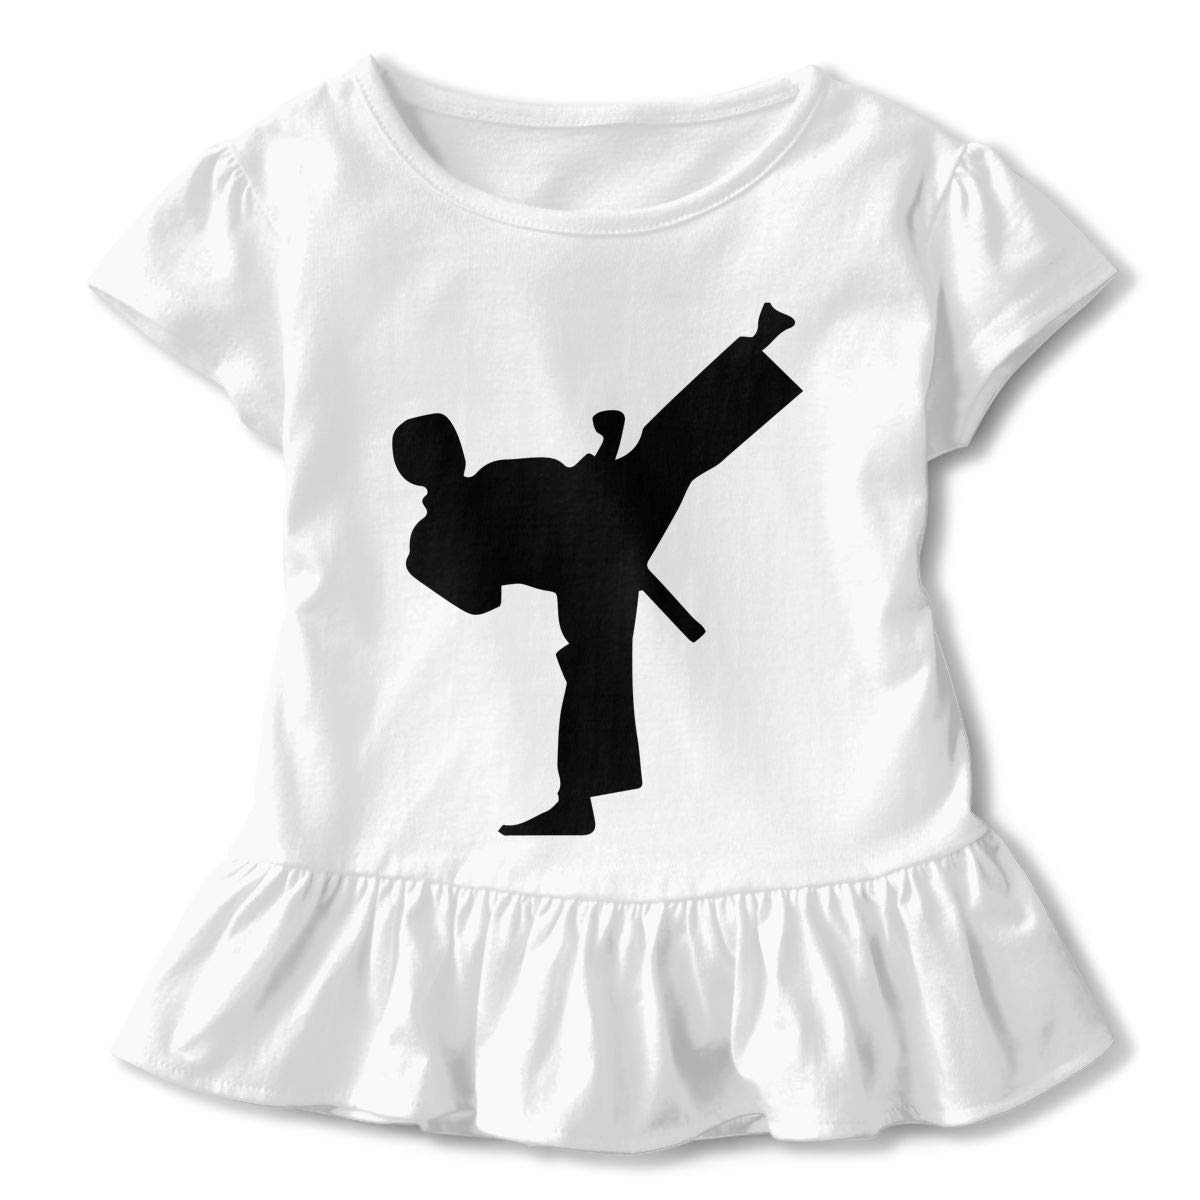 Taekwondo Silhouette Toddler//Infant Girls Short Sleeve Shirts Ruffles Shirt Tee for 2-6T